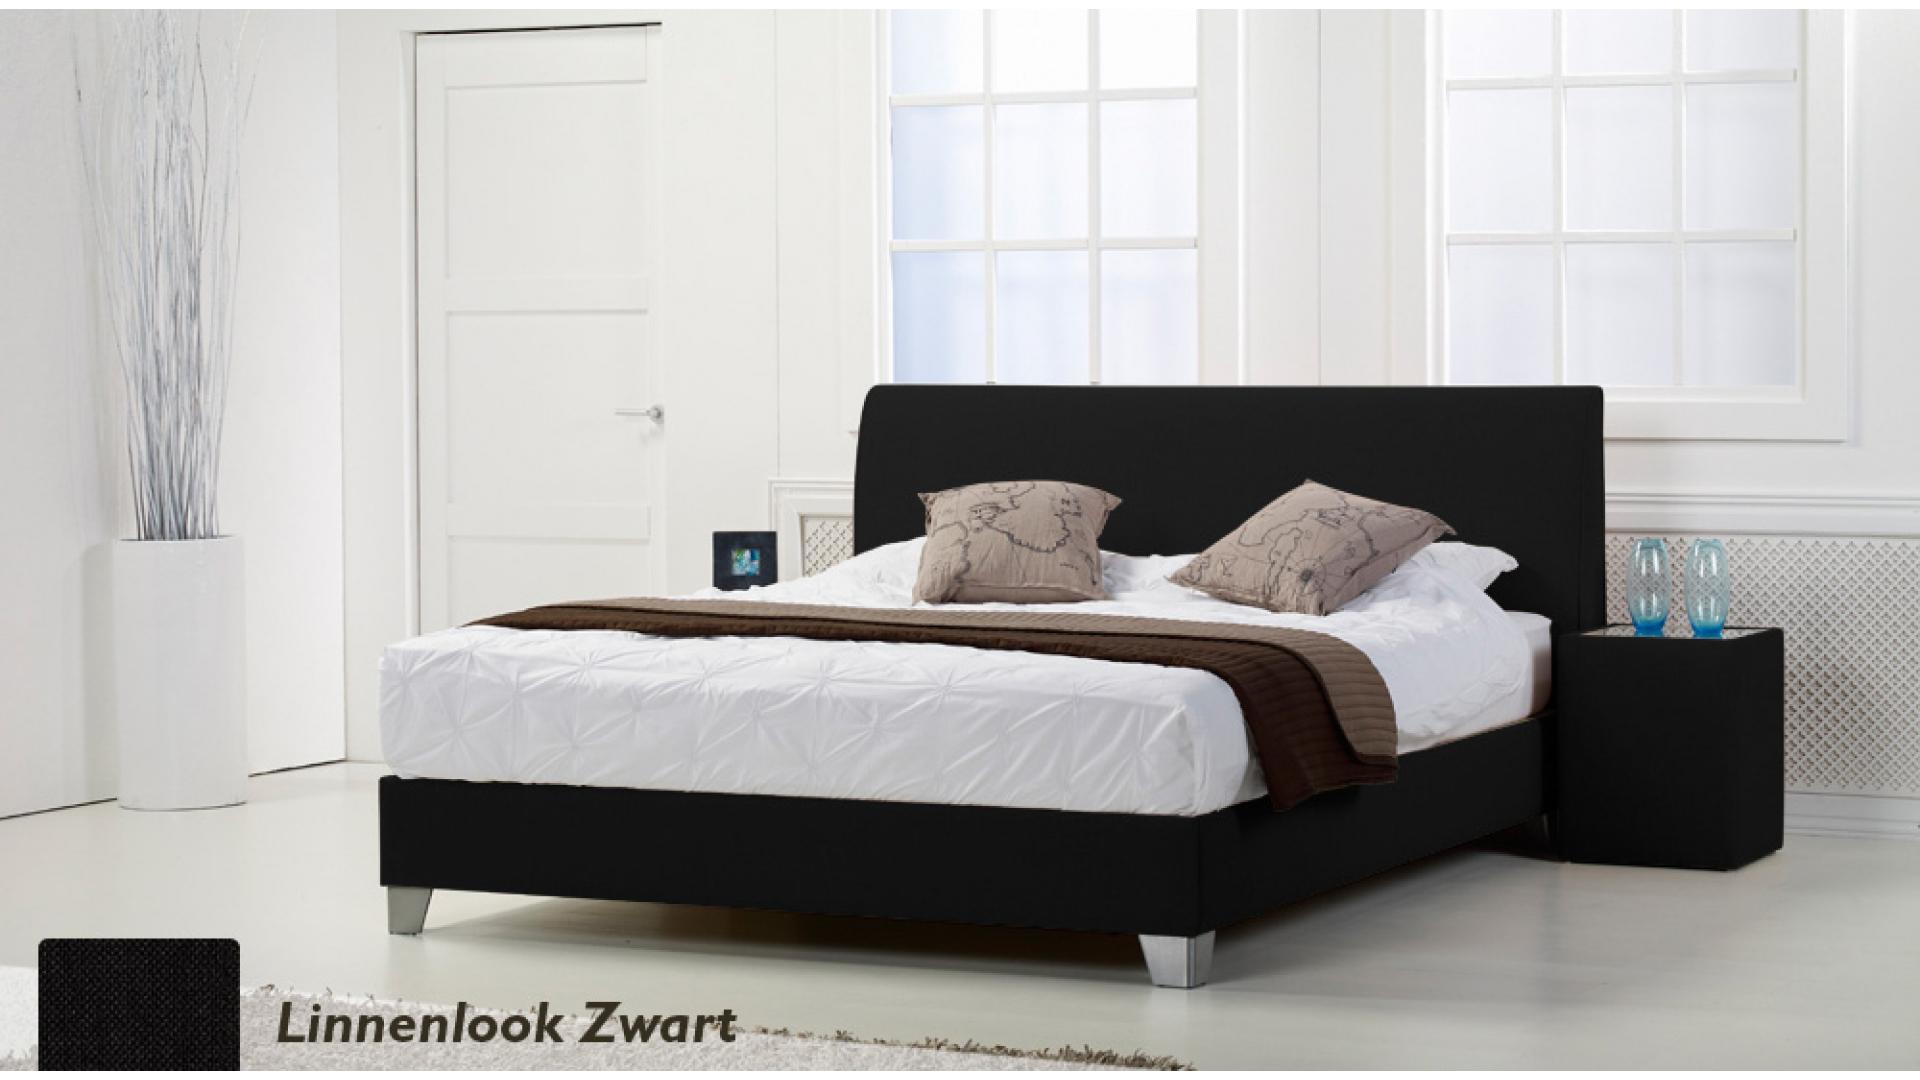 waterbed basic box pro linnenlook zwart boxspring-look